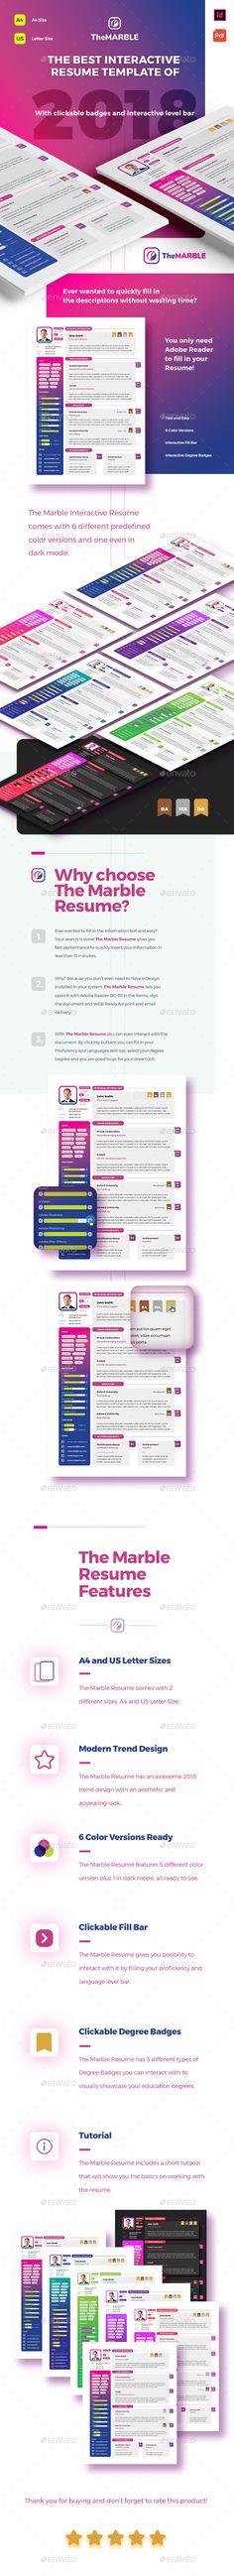 Interactive Cv Templates%0A The Marble Resume